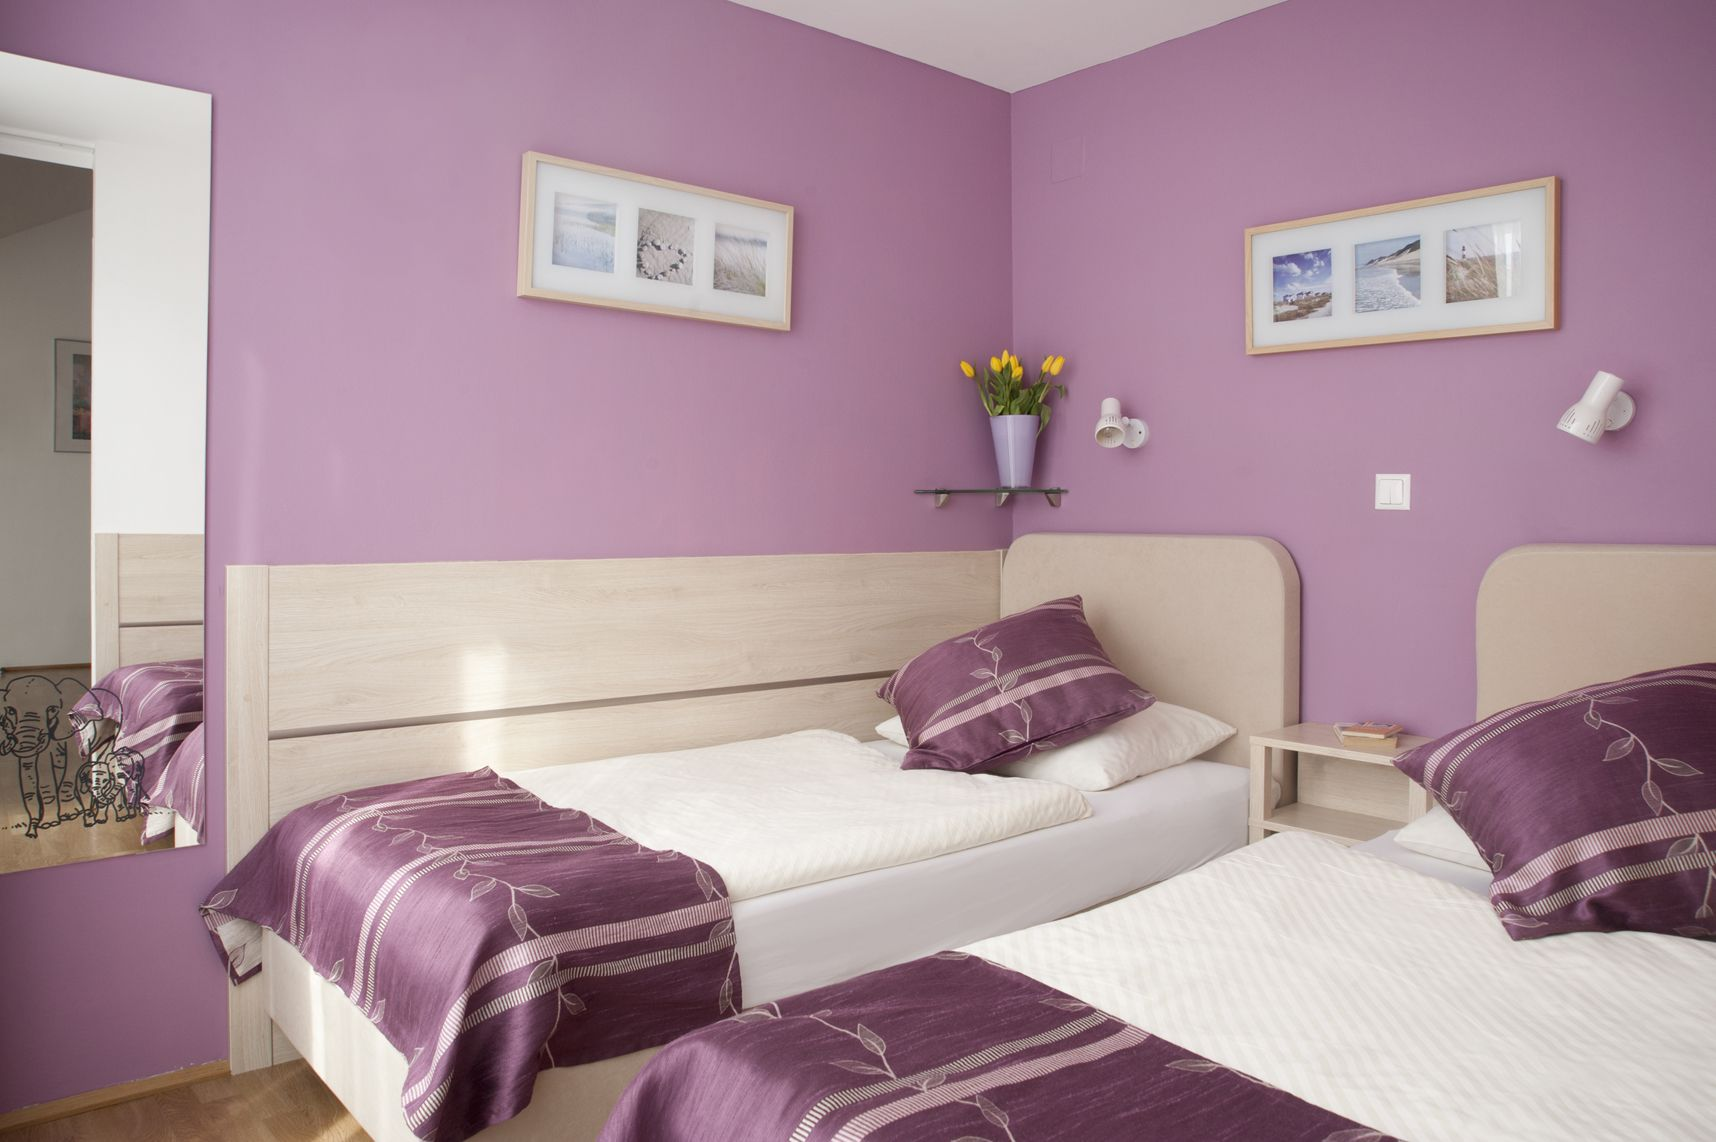 Bedroom interior roof bedroom with variant  single beds  appartement   pinterest